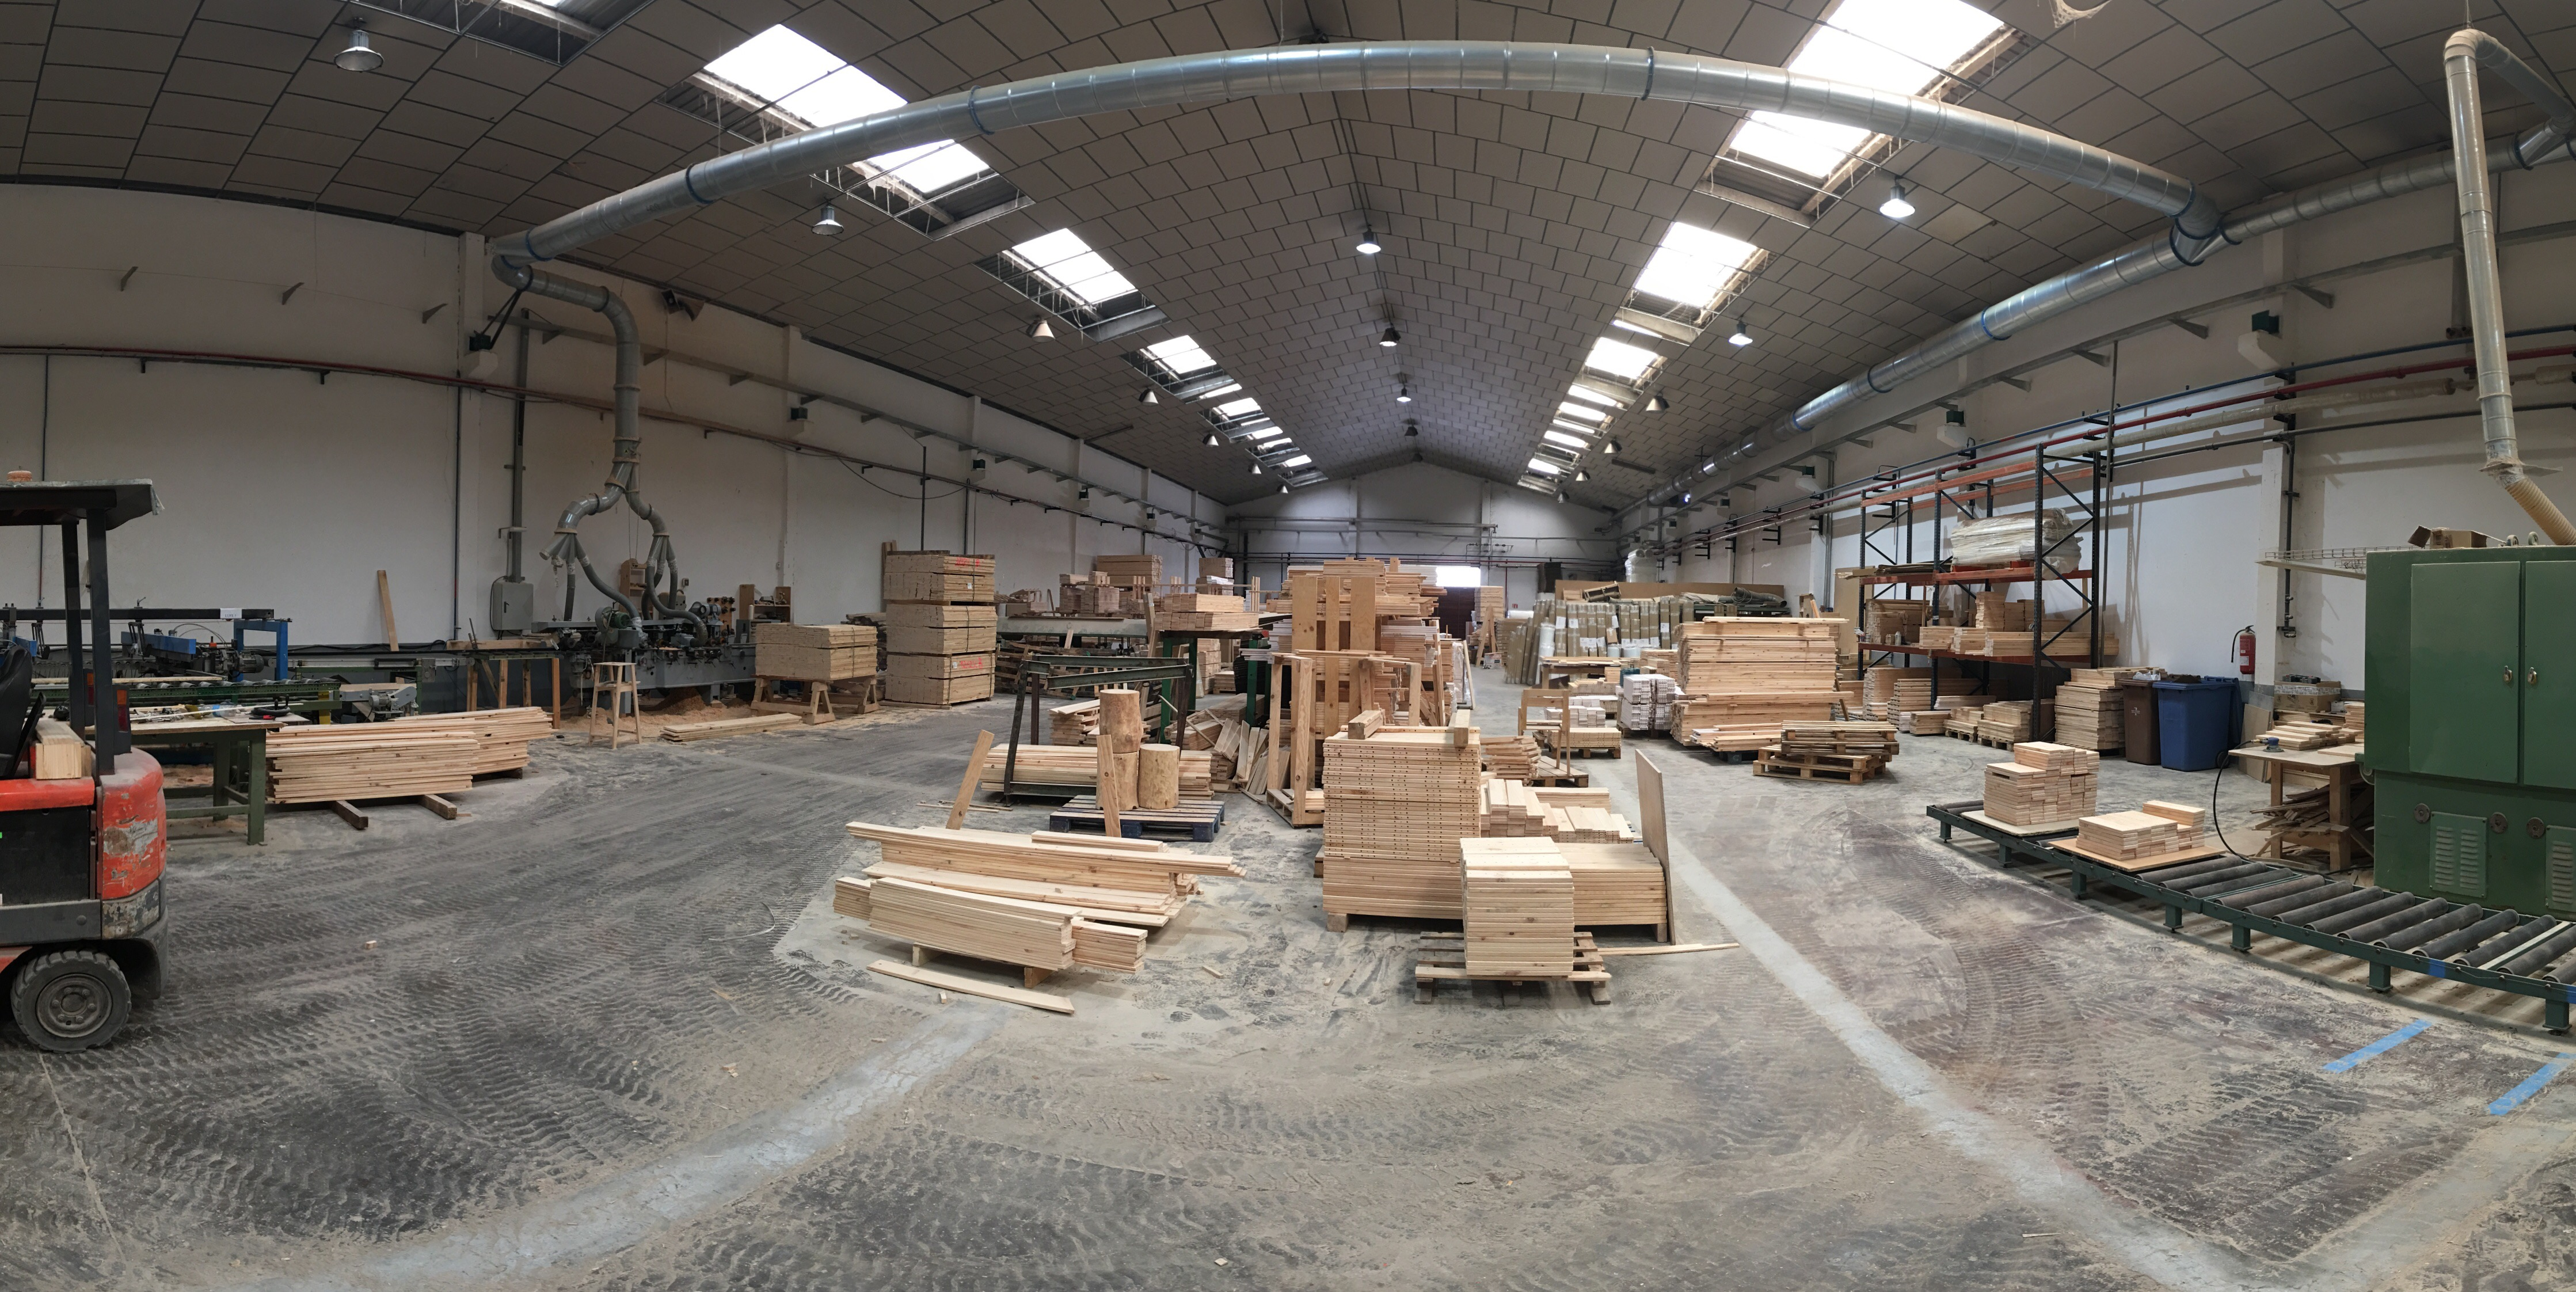 Fabrica de Muebles LUFE en Azpeitia, muebles low cost